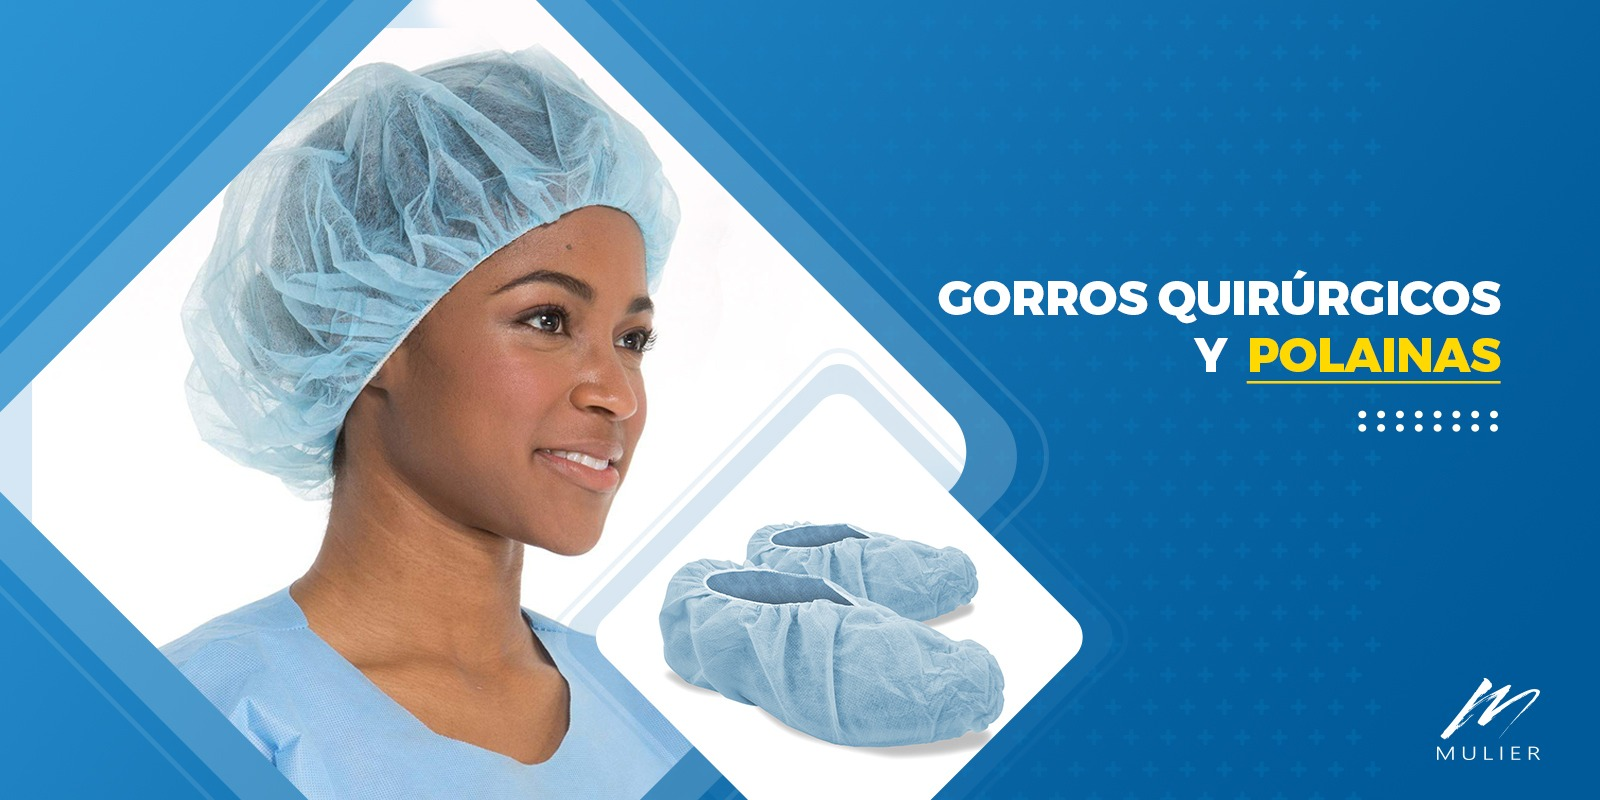 Gorros Quirurgicos y Polainas